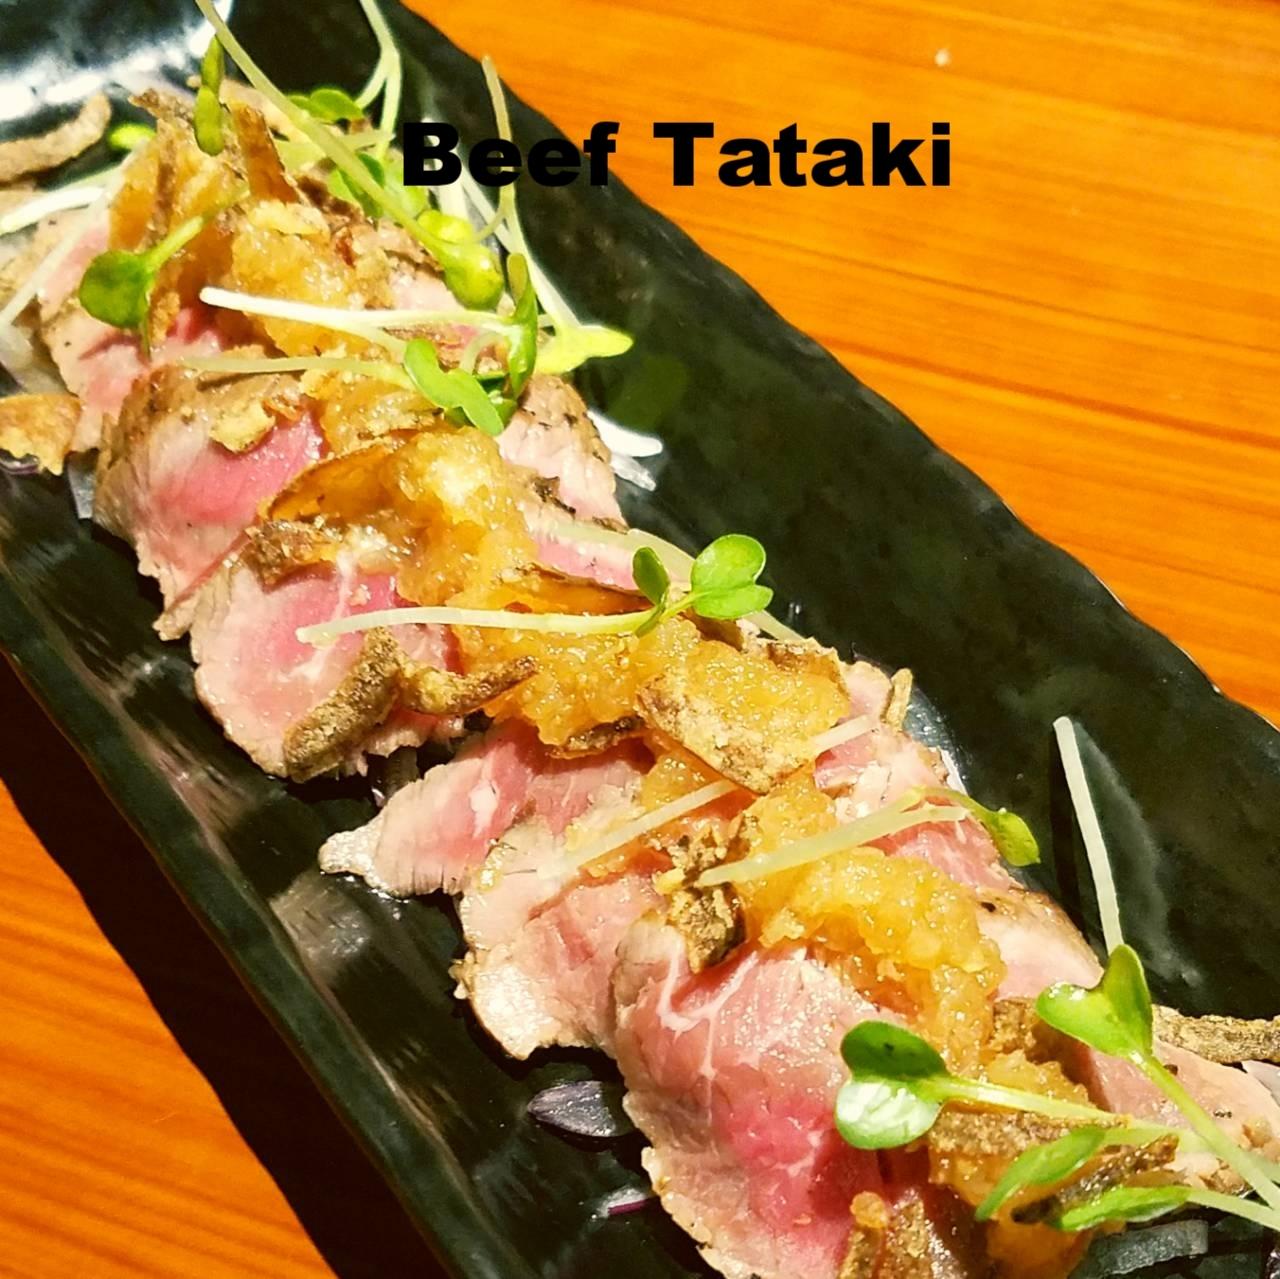 Beef Tataki.jpg